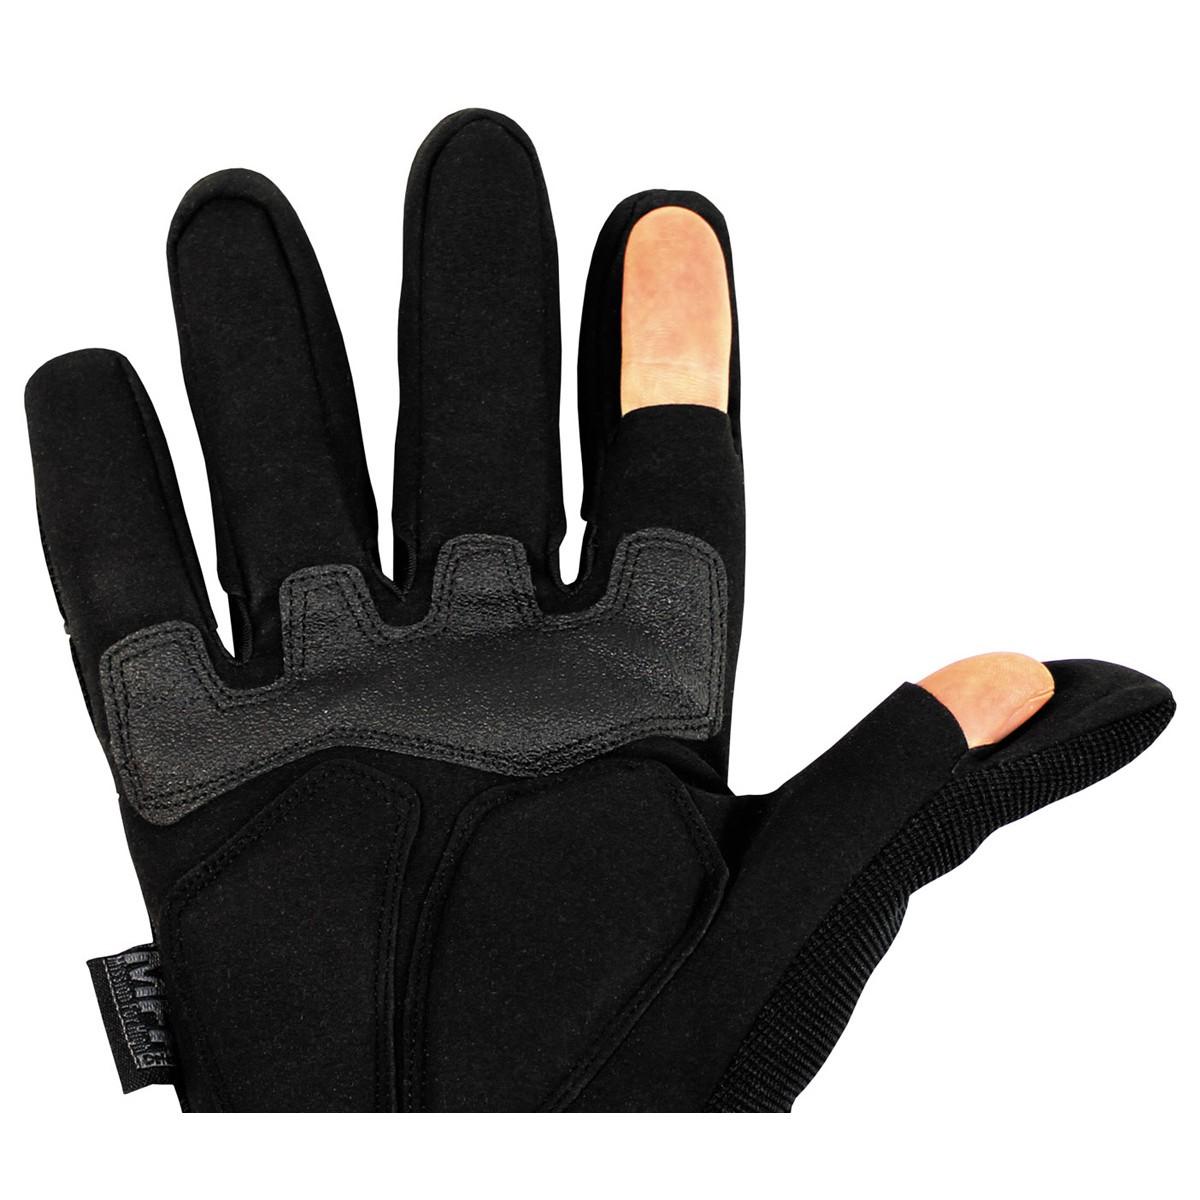 mfh tactical handschuhe stake einsatzhandschuhe